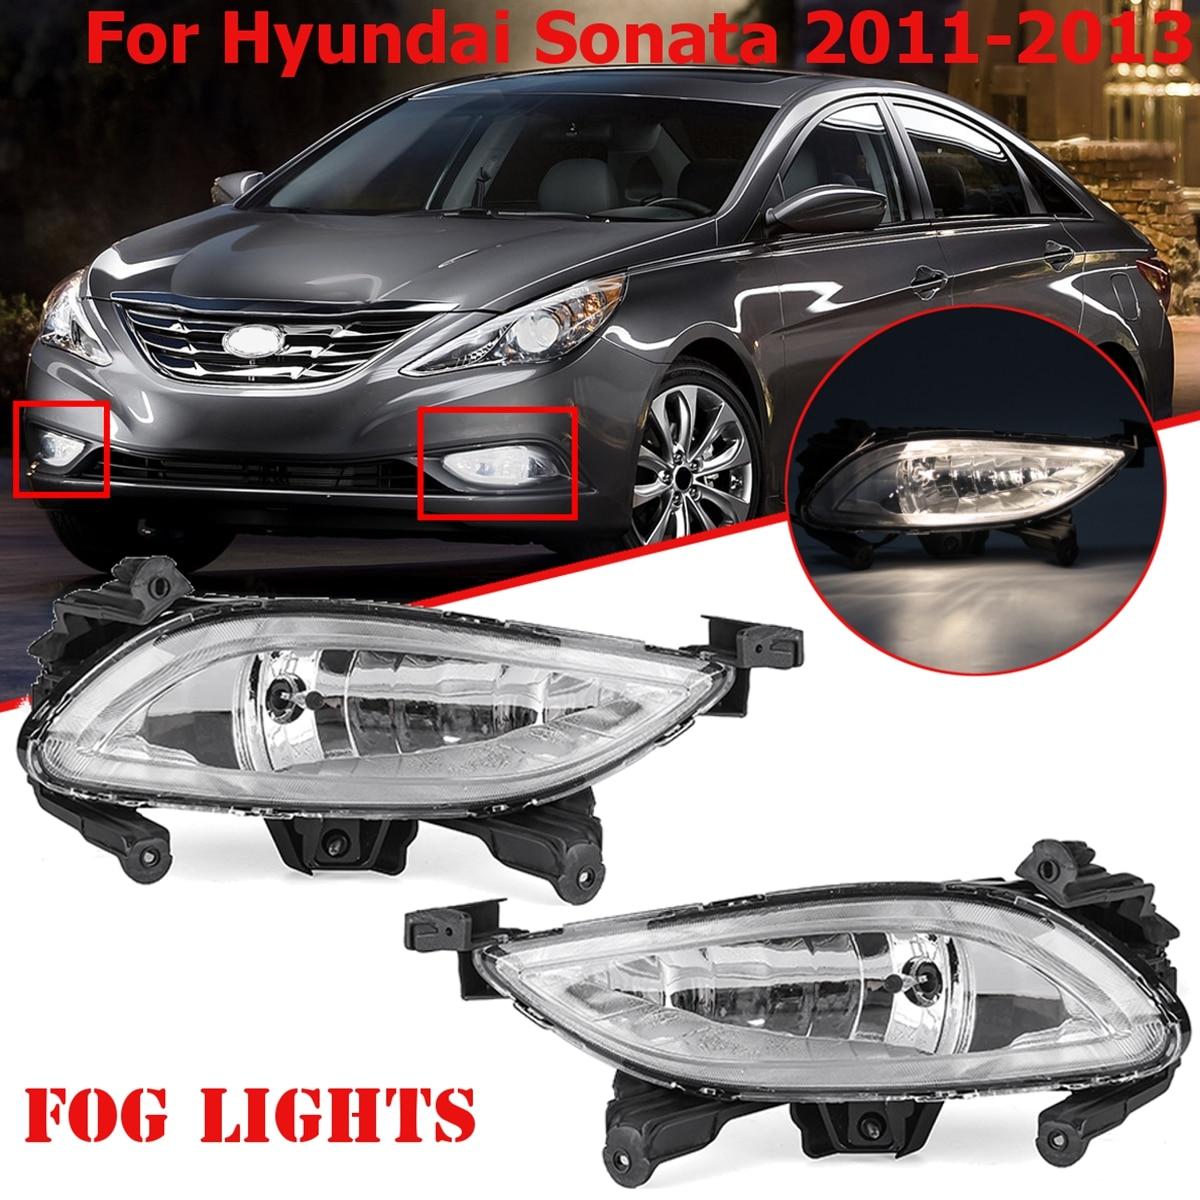 1 Pair Front Halogen Fog Lights Lamps Turn Signal Light Front Bumper Fog Light for Hyundai Sonata 2011 2012 2013 for lifan x60 turn signal light bar lights x60 suv front fog lamp